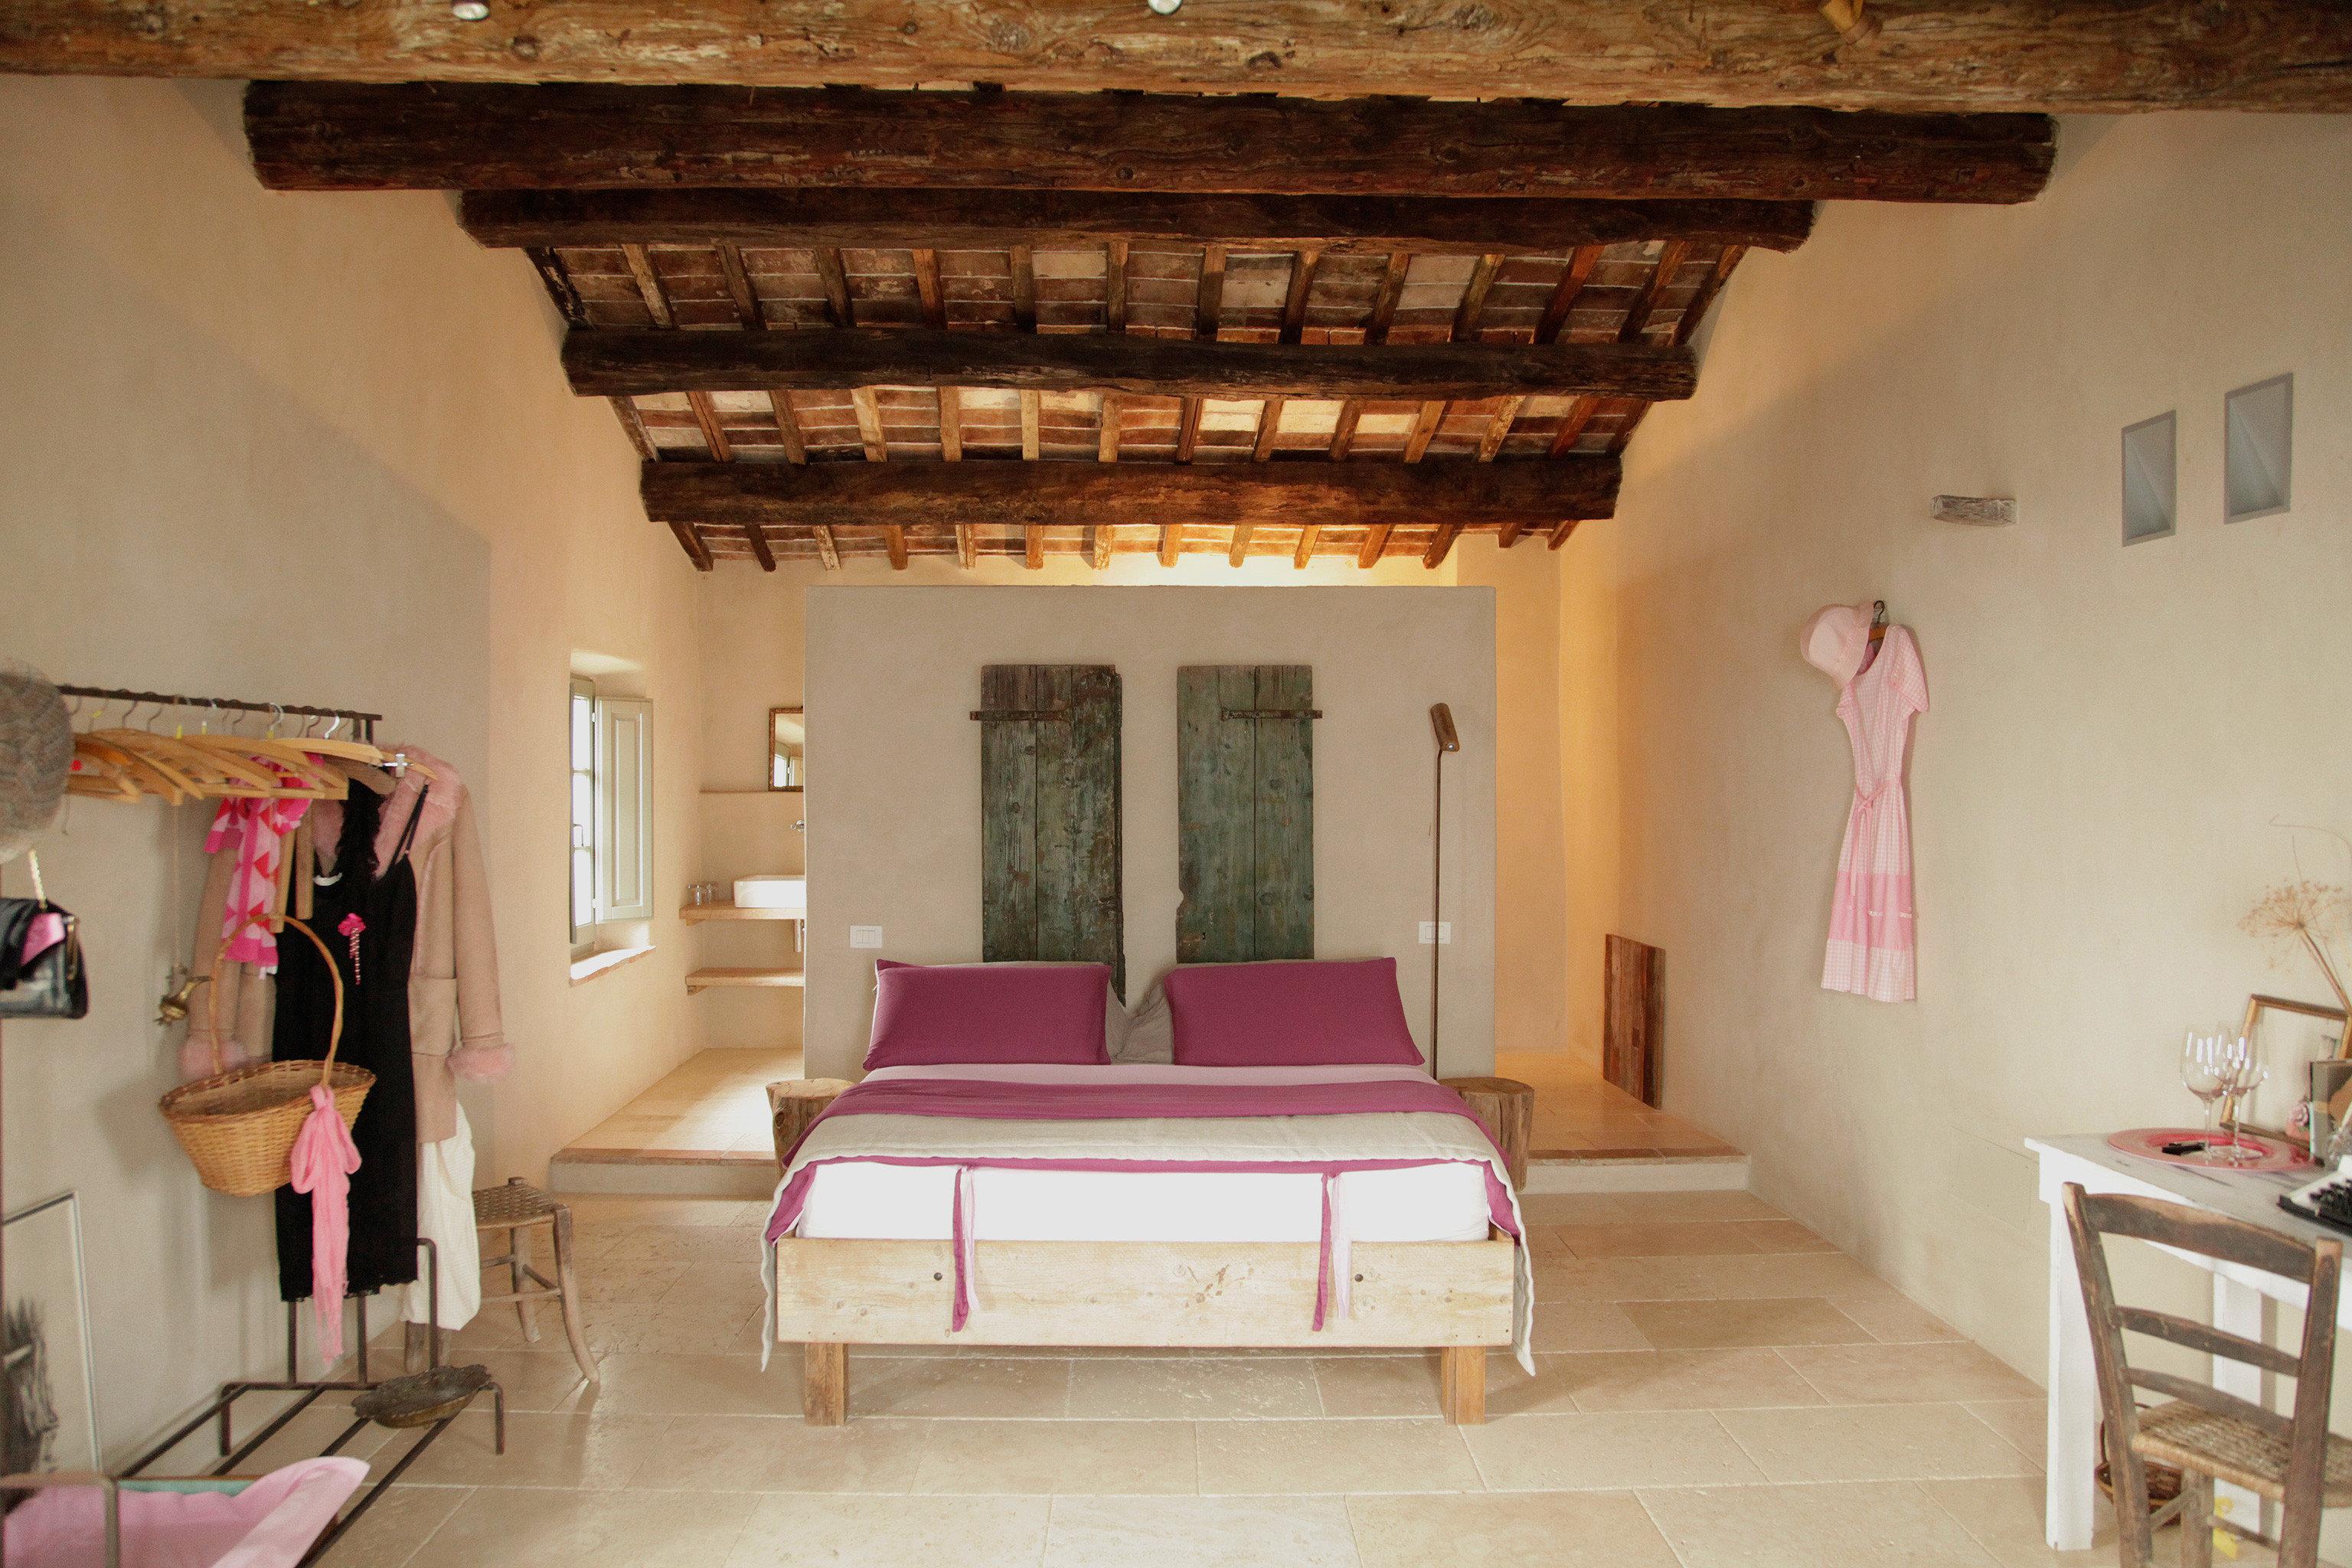 B&B Bedroom Country Elegant Luxury Romantic Suite property living room Villa cottage farmhouse mansion hacienda